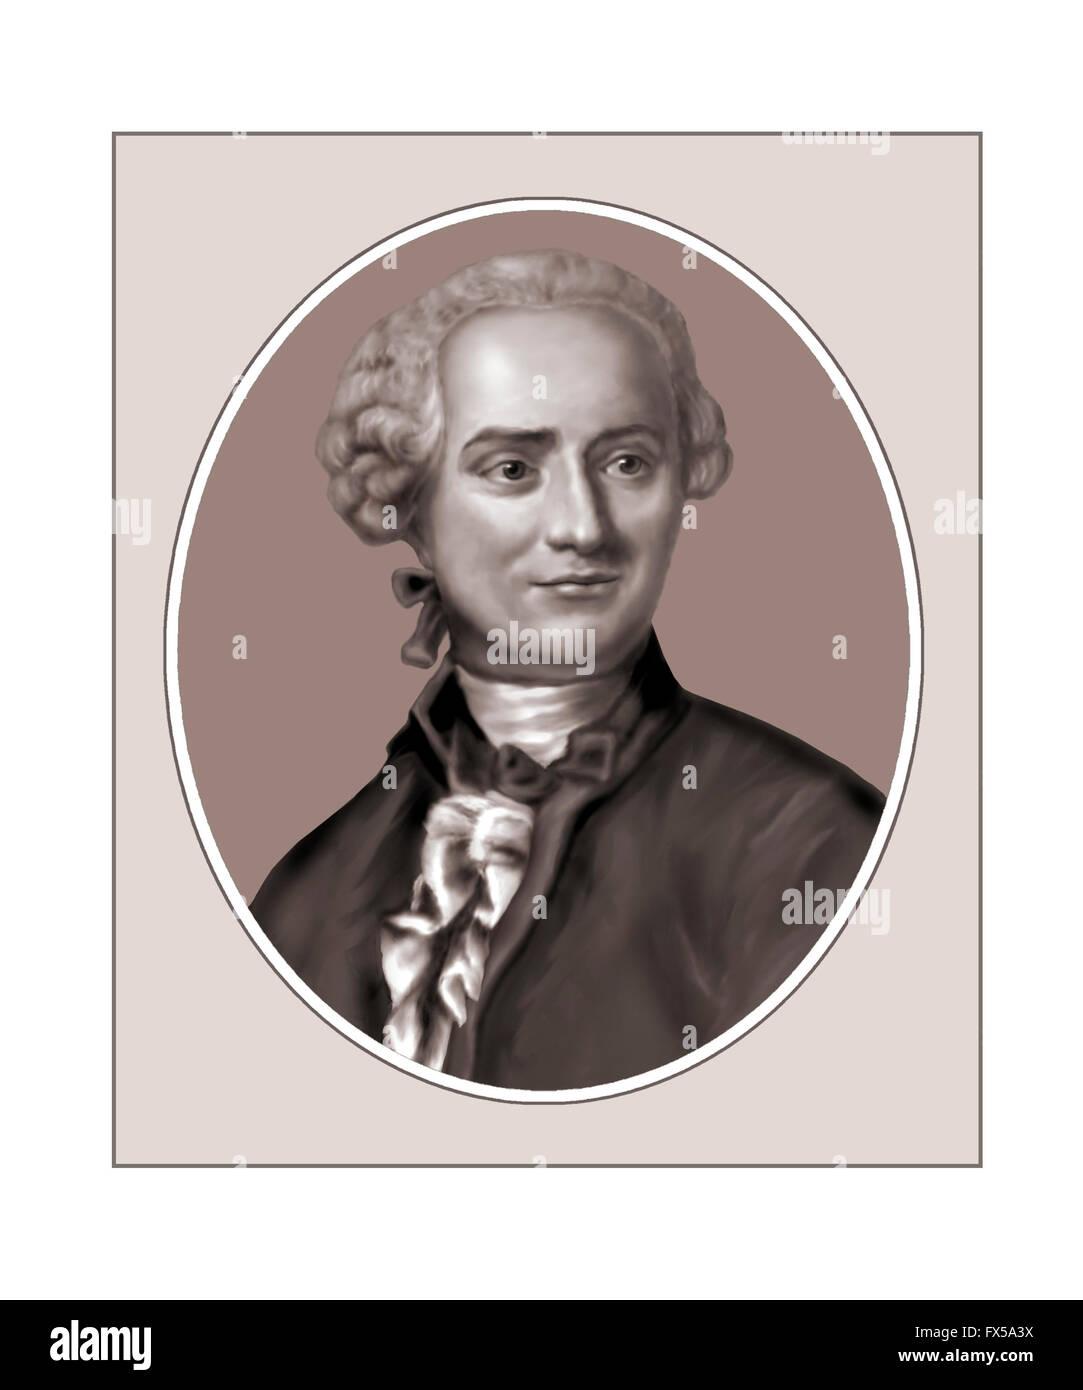 Jean Le Rond d'Alembert, 1717-1783, mathématicien Photo Stock